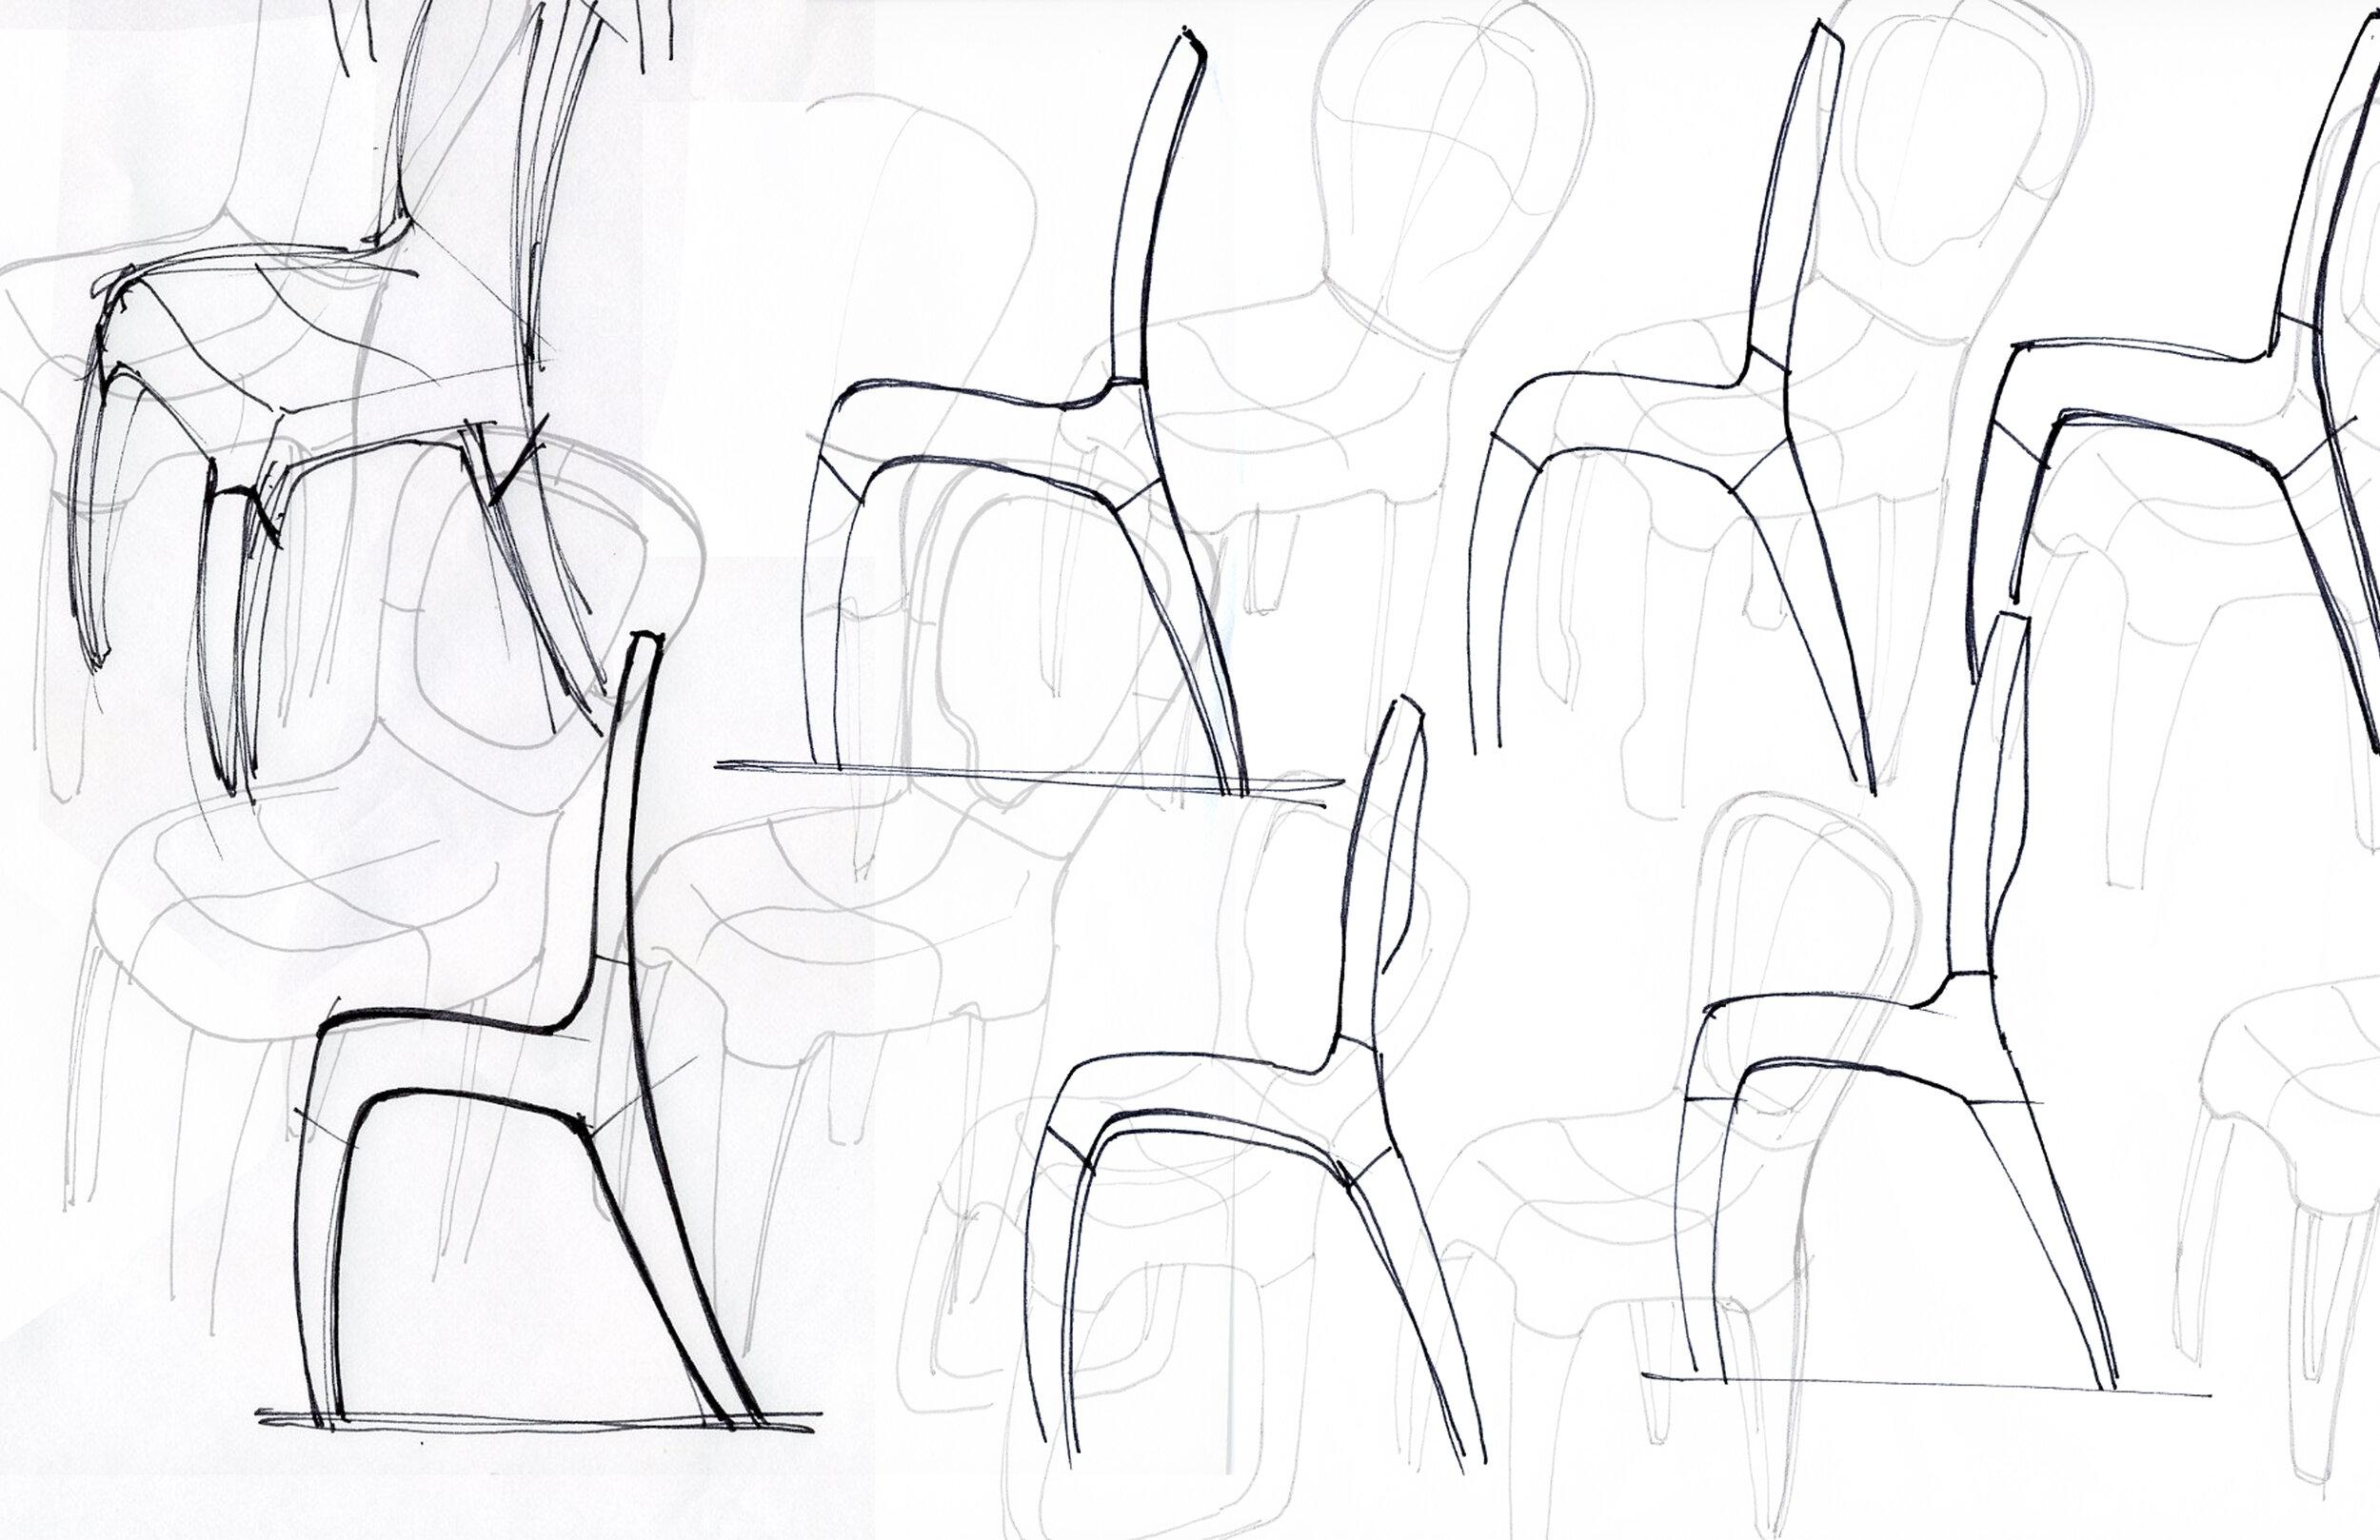 ram-industrial-design-Wendell-Dining-Chair-sketches.jpg